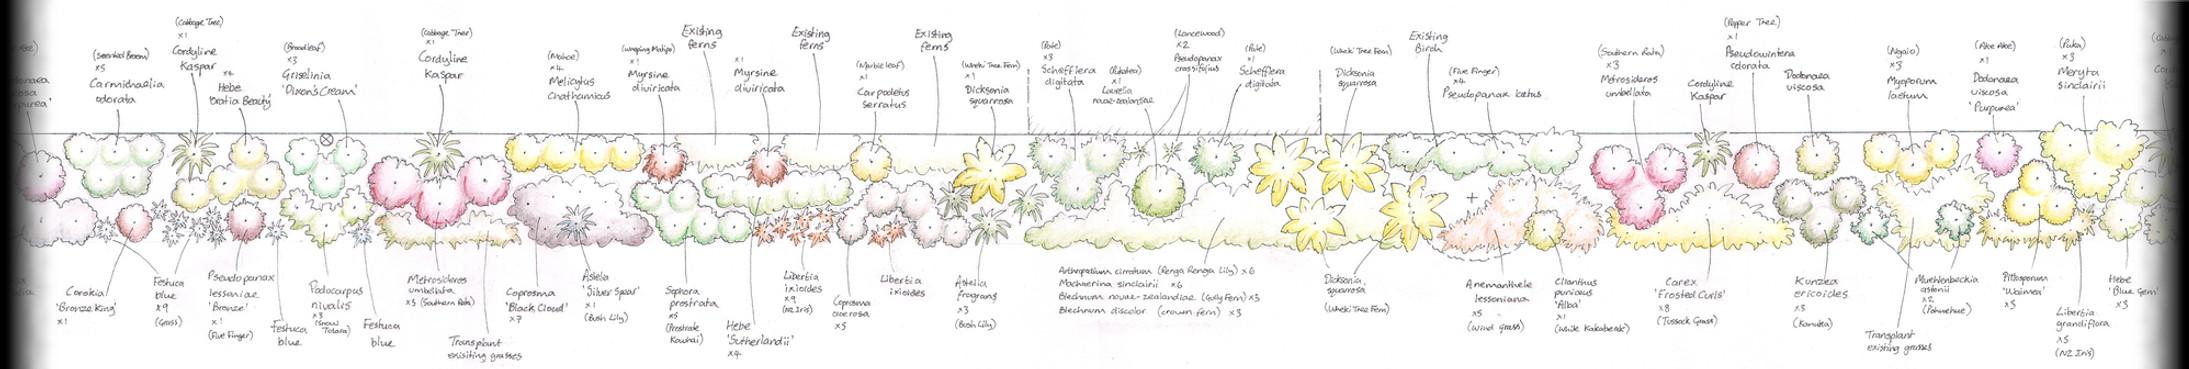 NZ_native_planting_plan.jpg